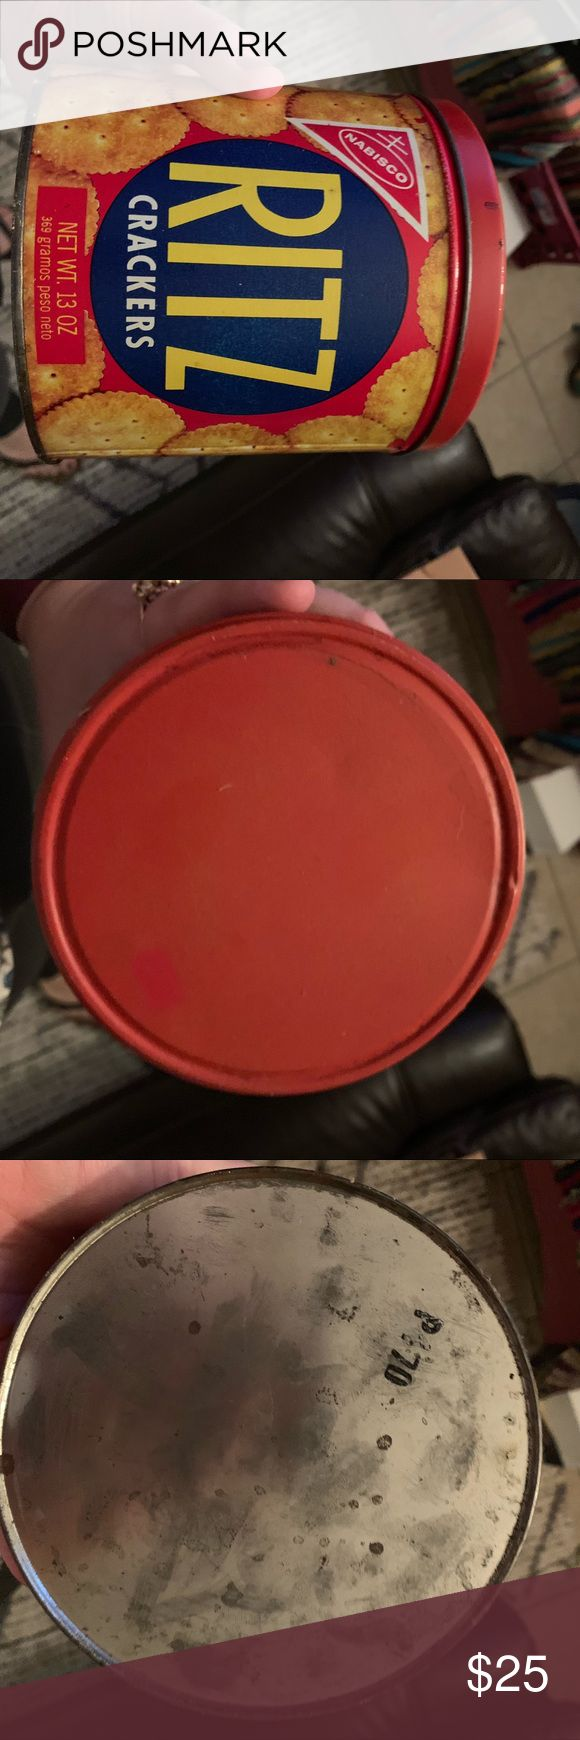 VINTAGE 1977 RITZ TIN Very cute tin from ritz crac…